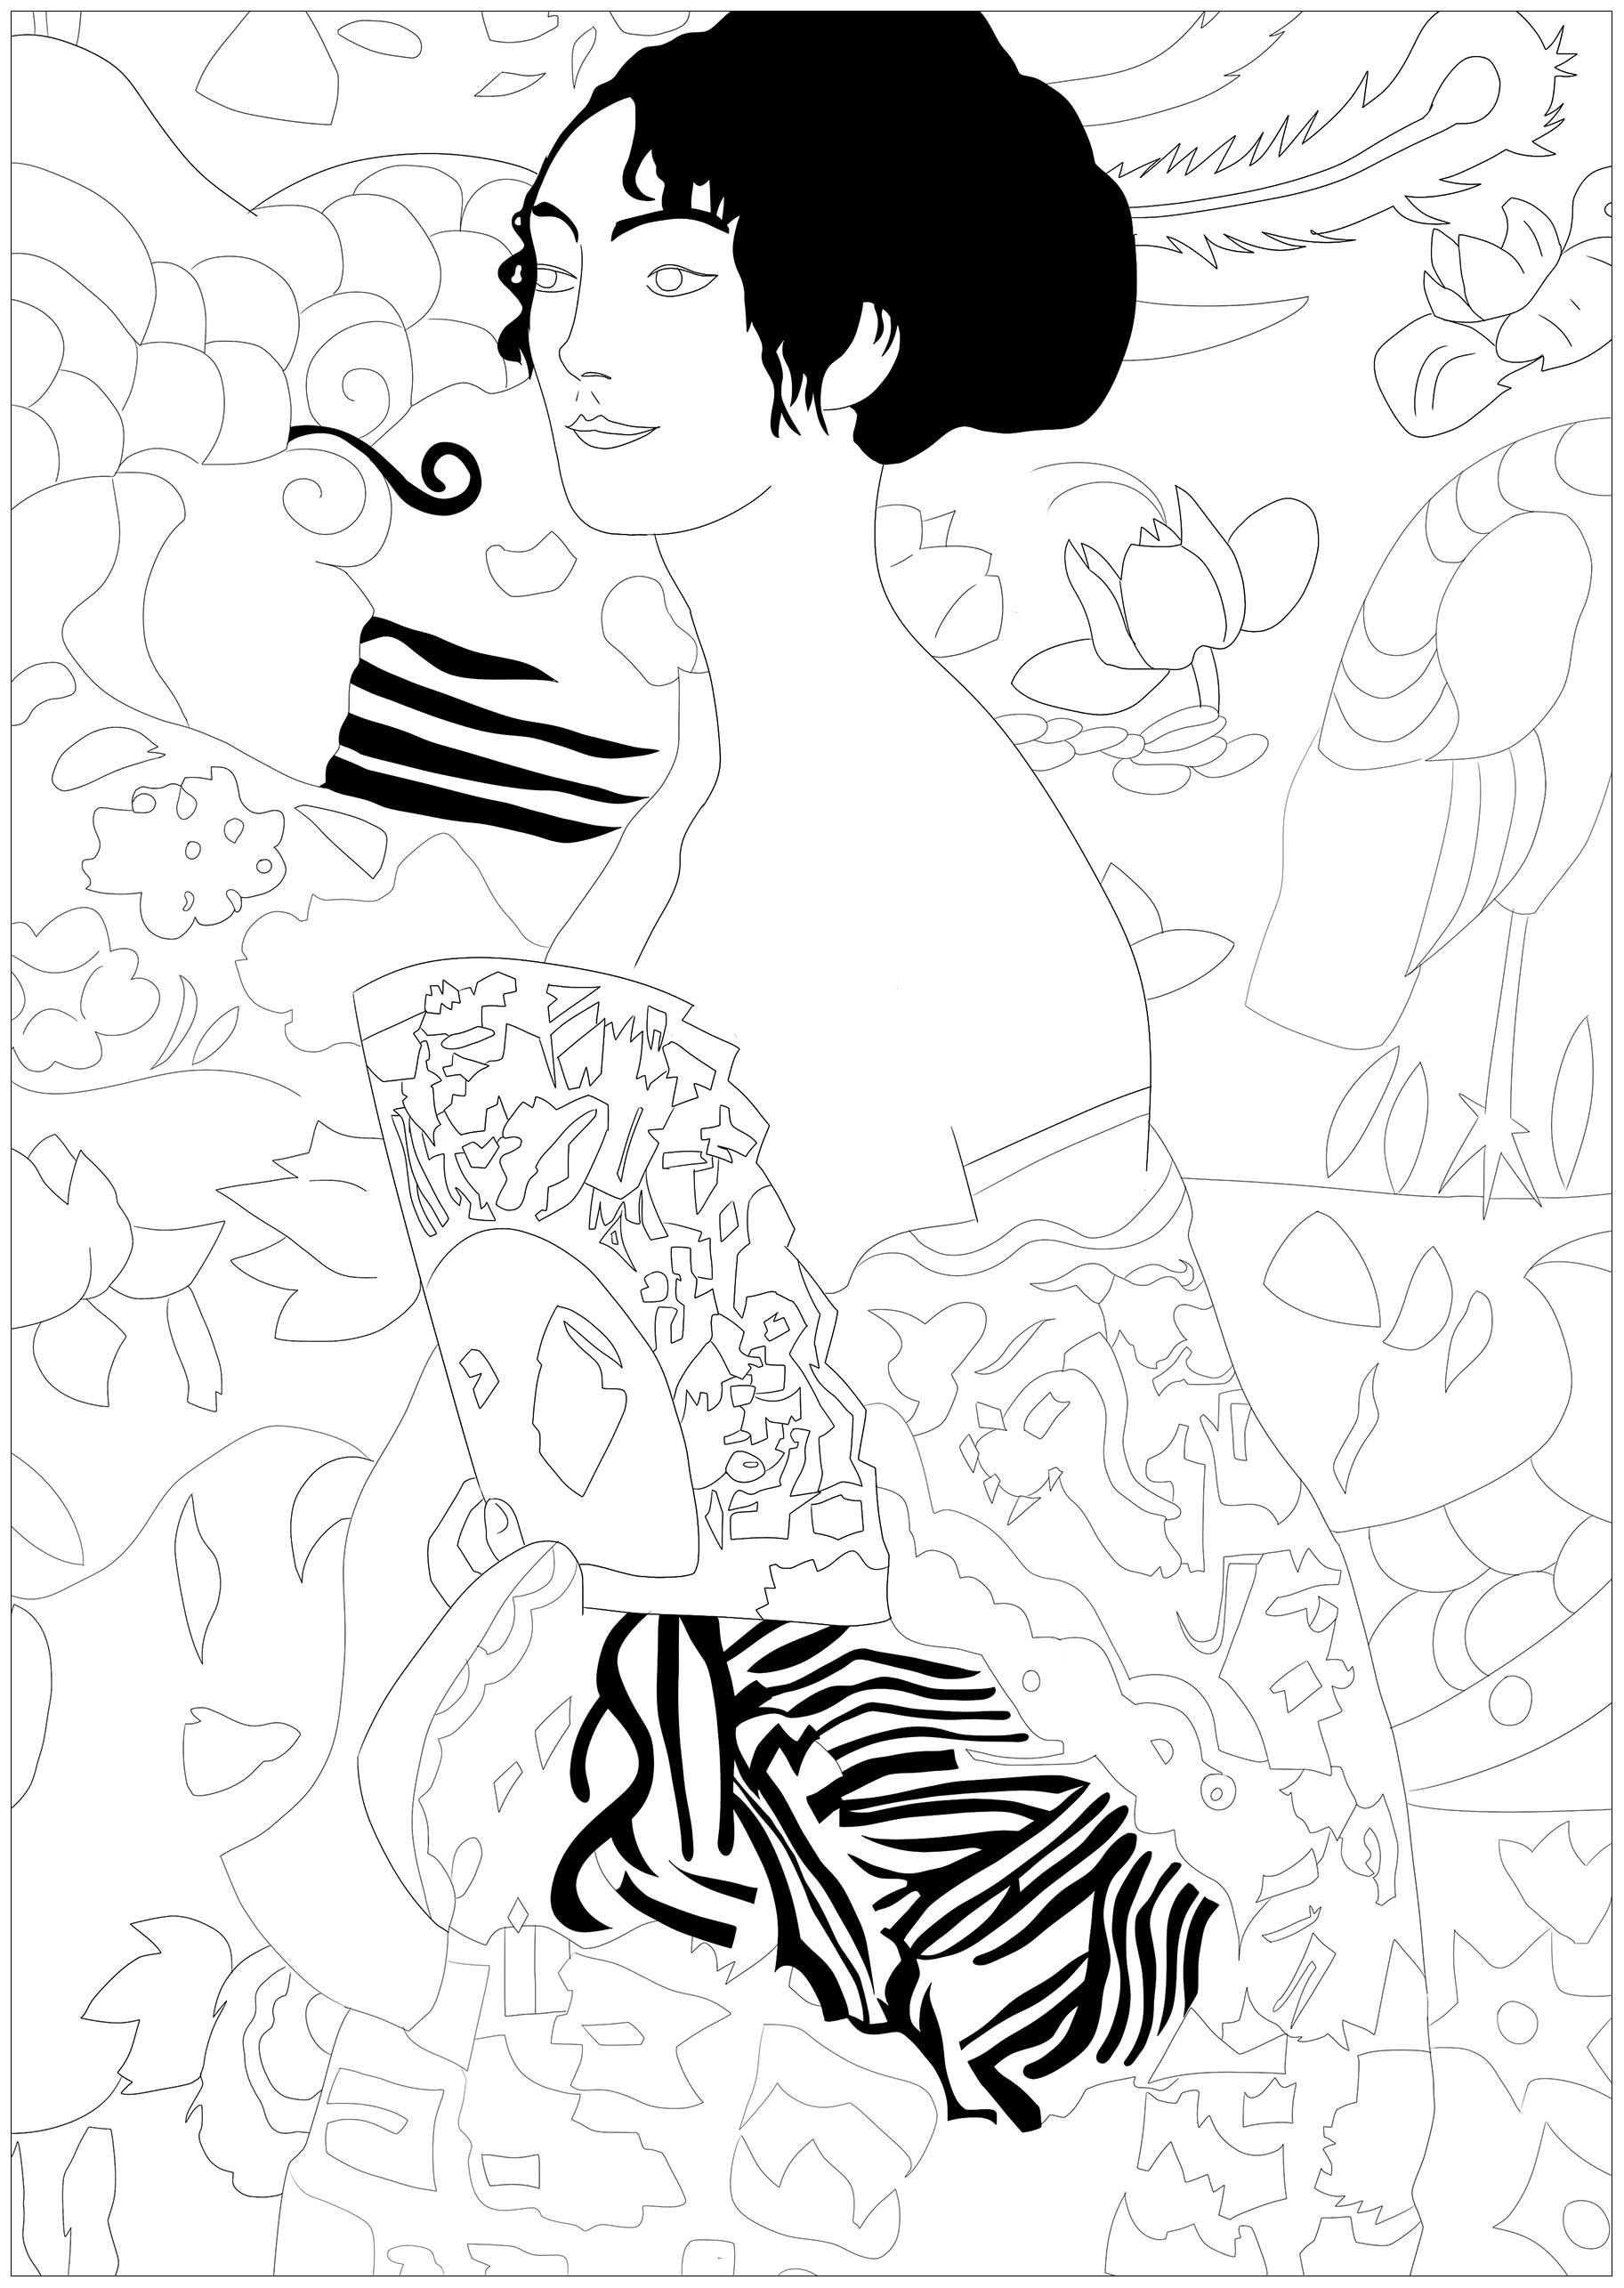 Colorear para adultos  : Obra de arte - 90